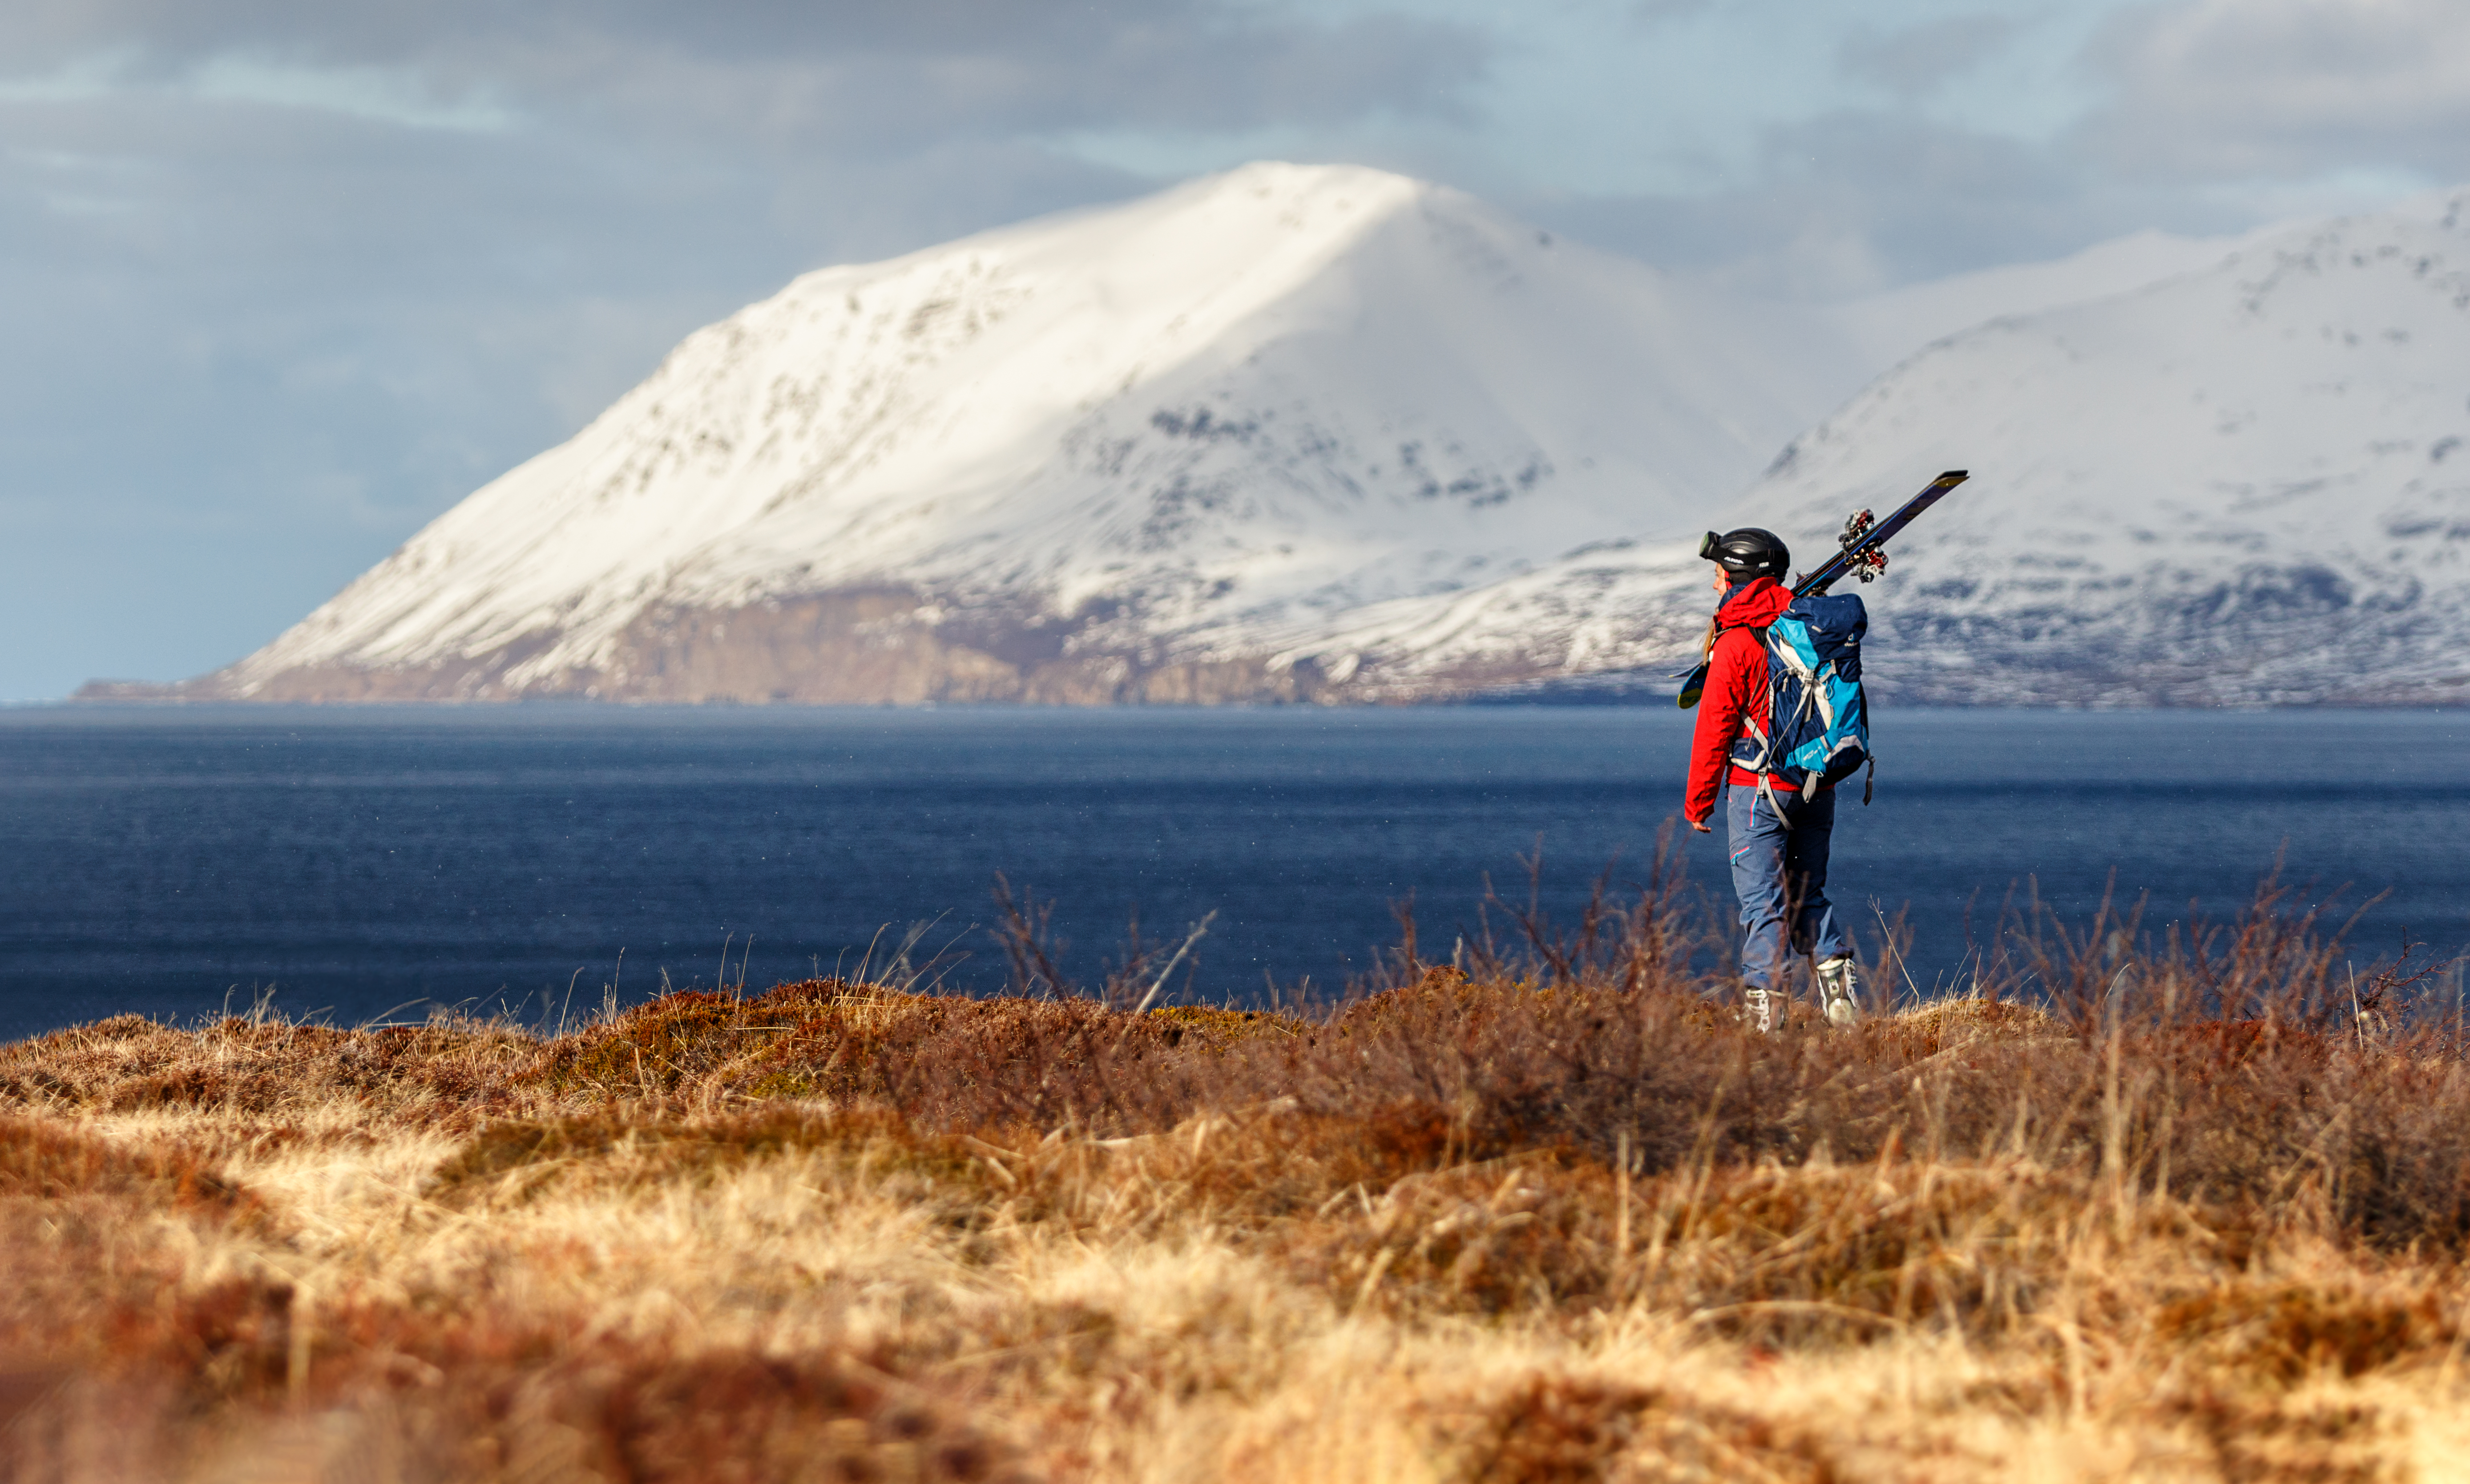 Ski touring in Iceland